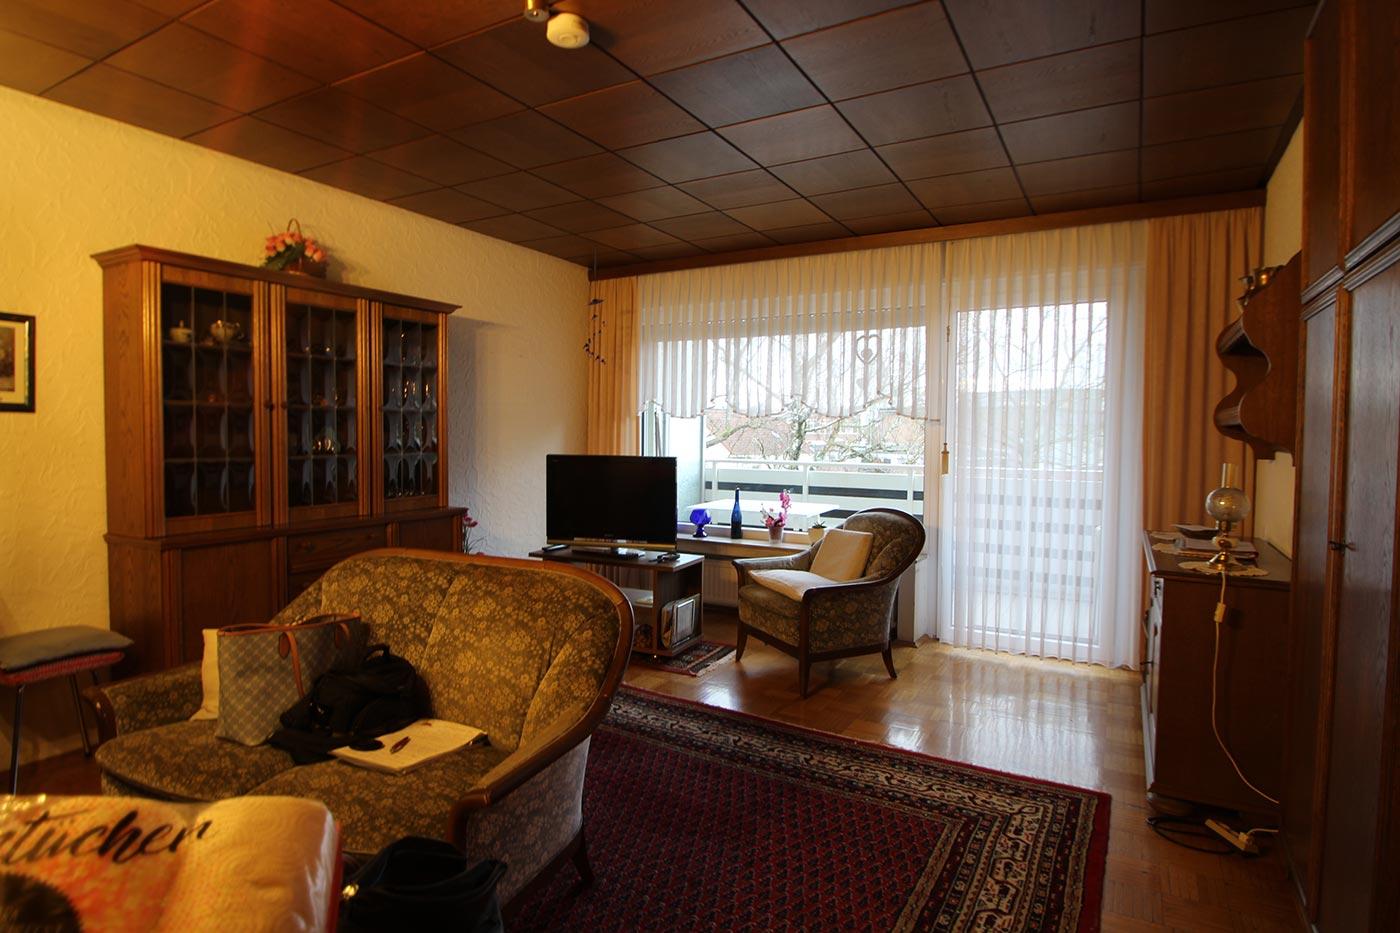 Vorher Foto vom Wohnzimmer. Vor dem Homestaging durch Blickfang Homestaging in Soest